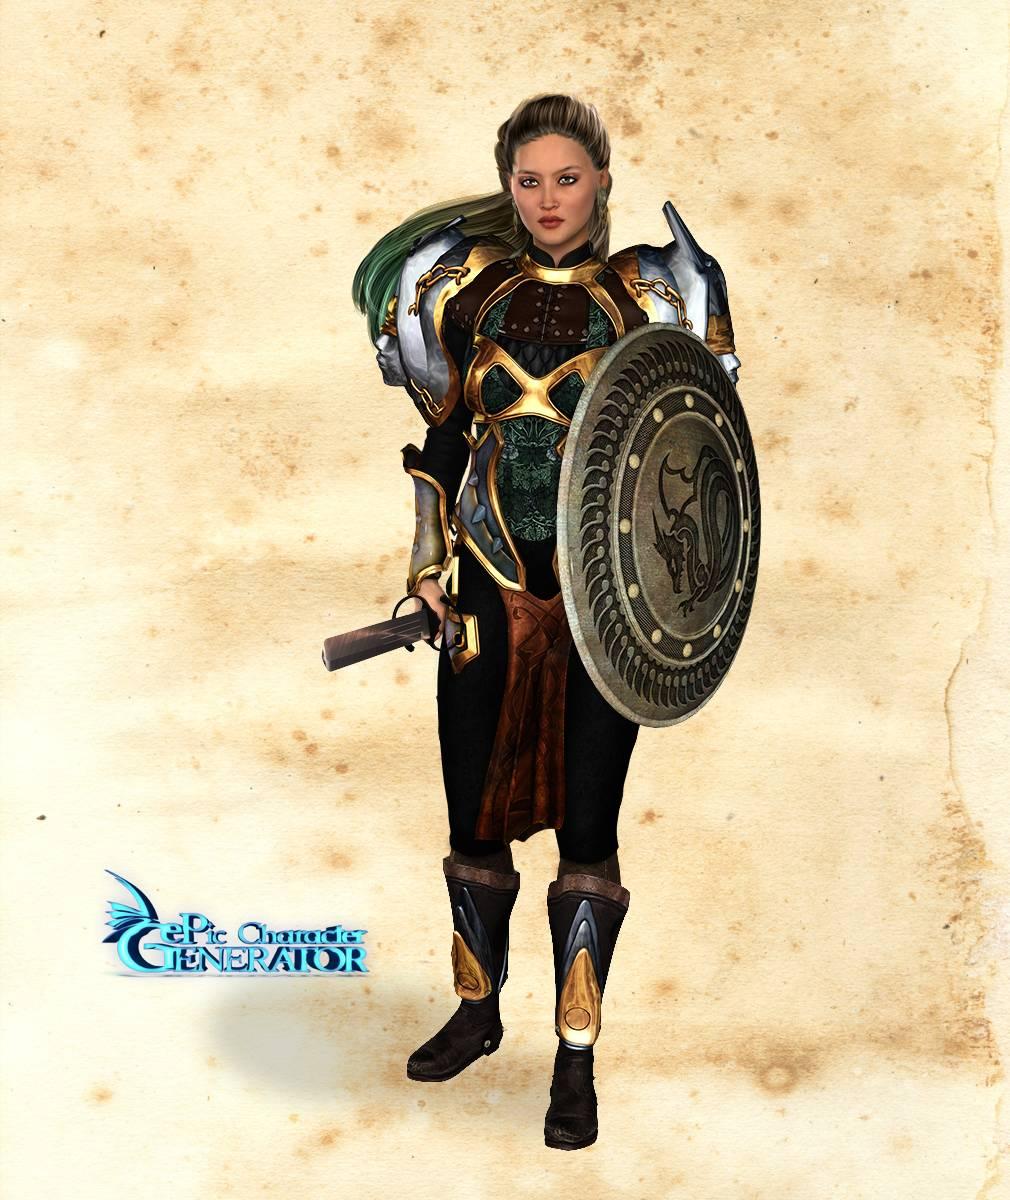 ePic Character Generator Season 2 Female Warrior Screenshot 07